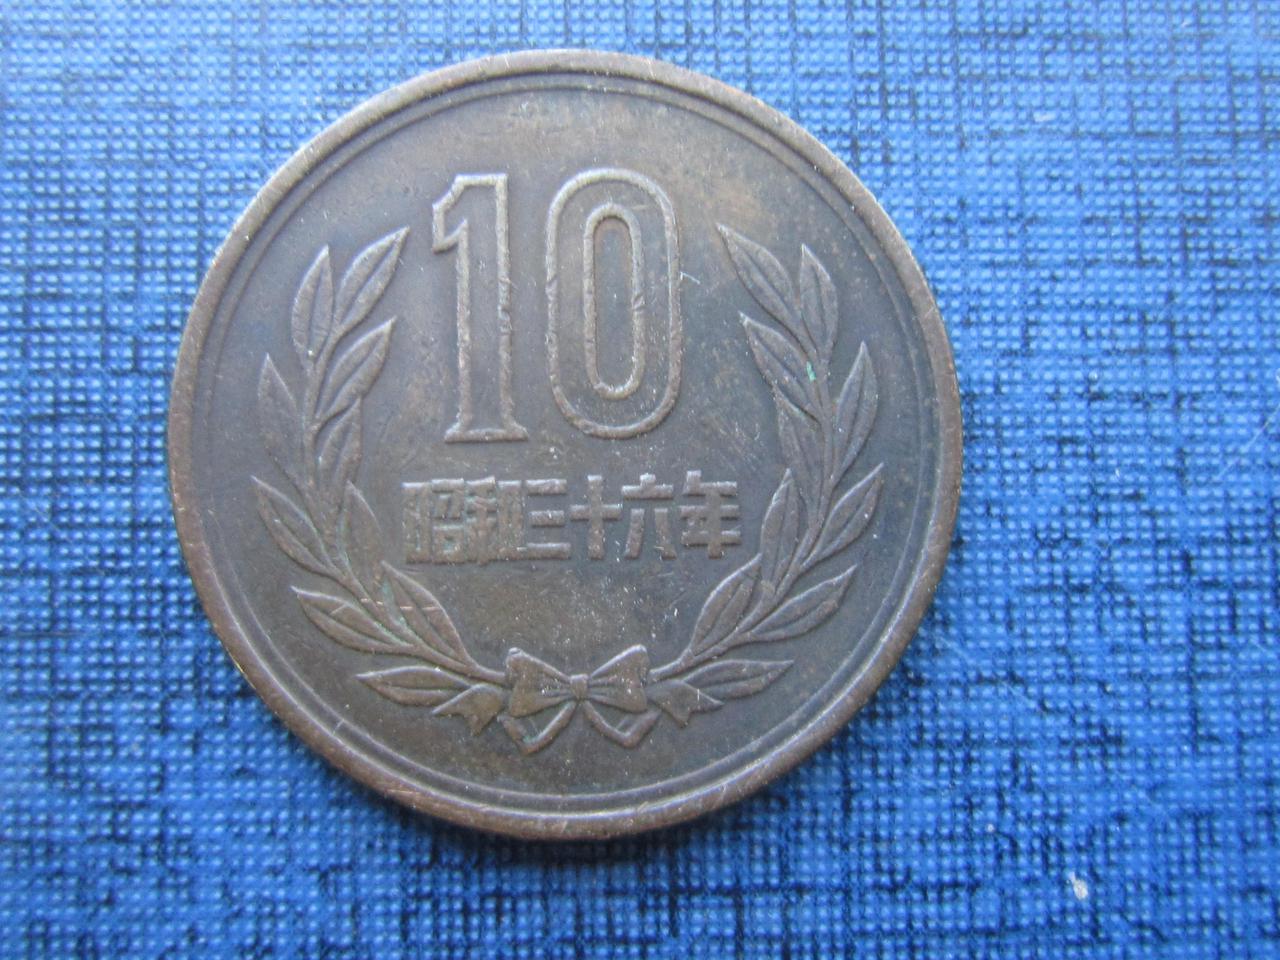 Винтаж: Монета Япония антикварная начало 20 века 1912-27 годы ... | 960x1280